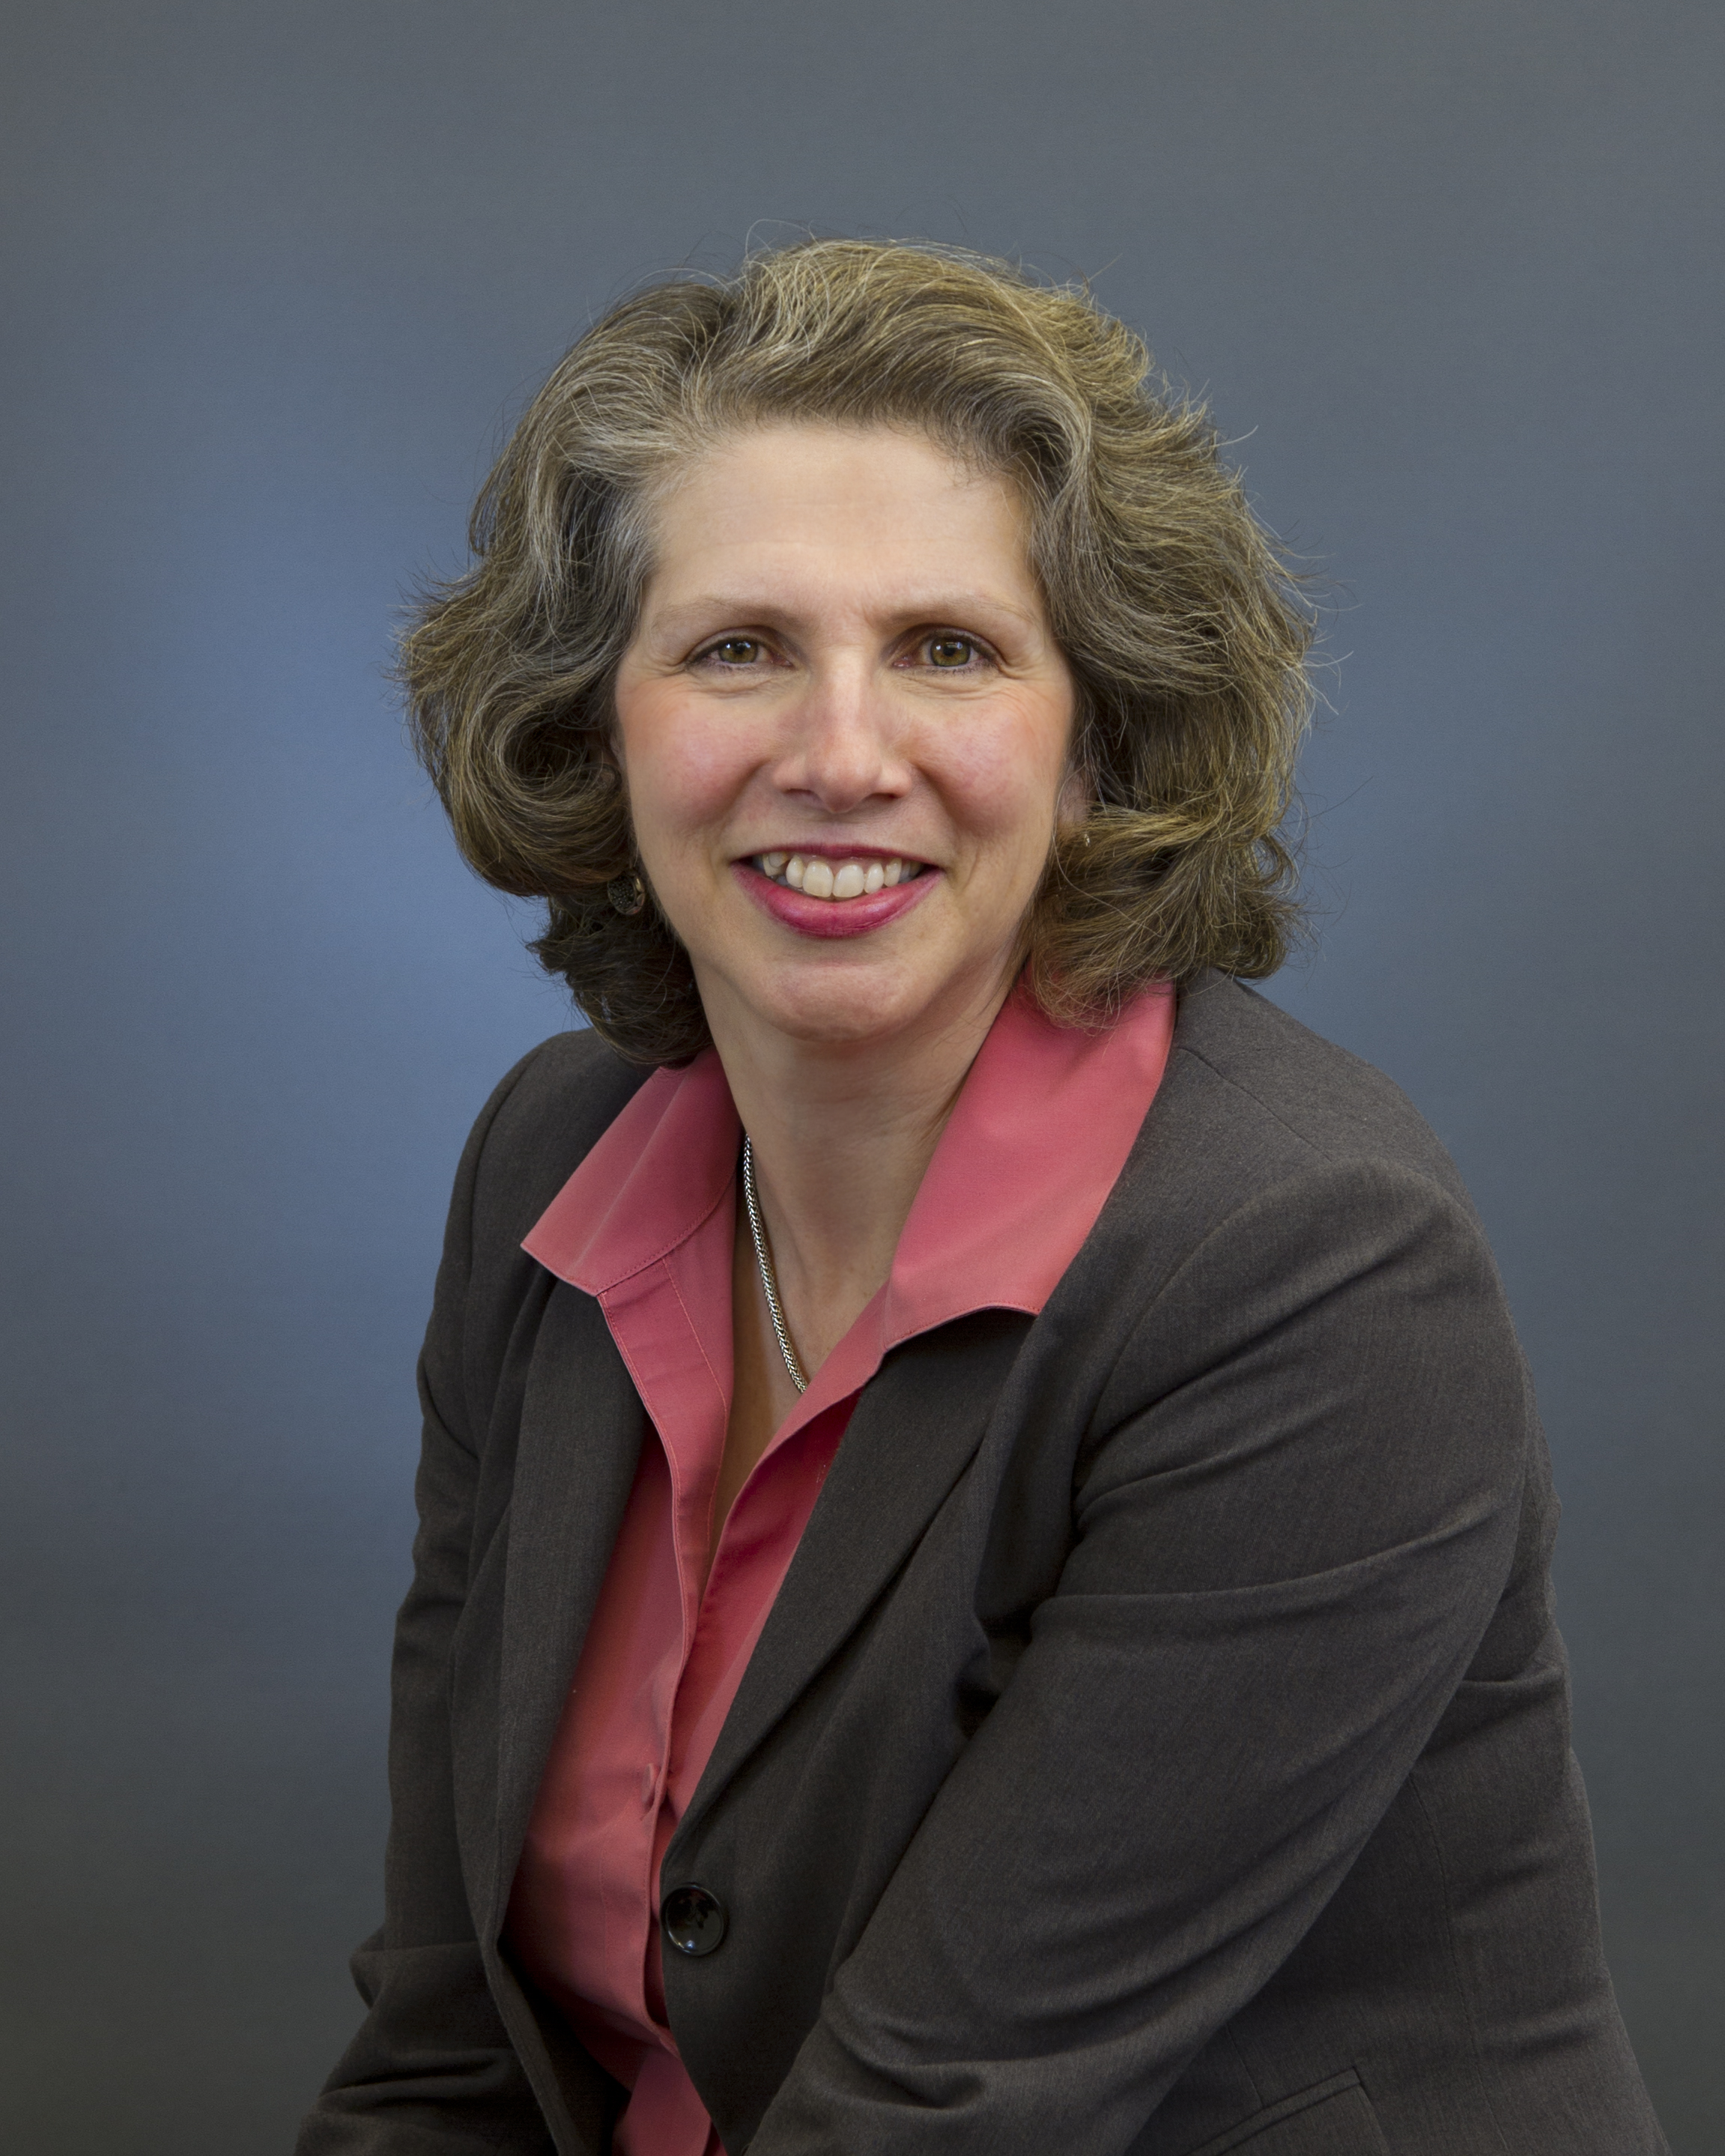 Marene N. Allison